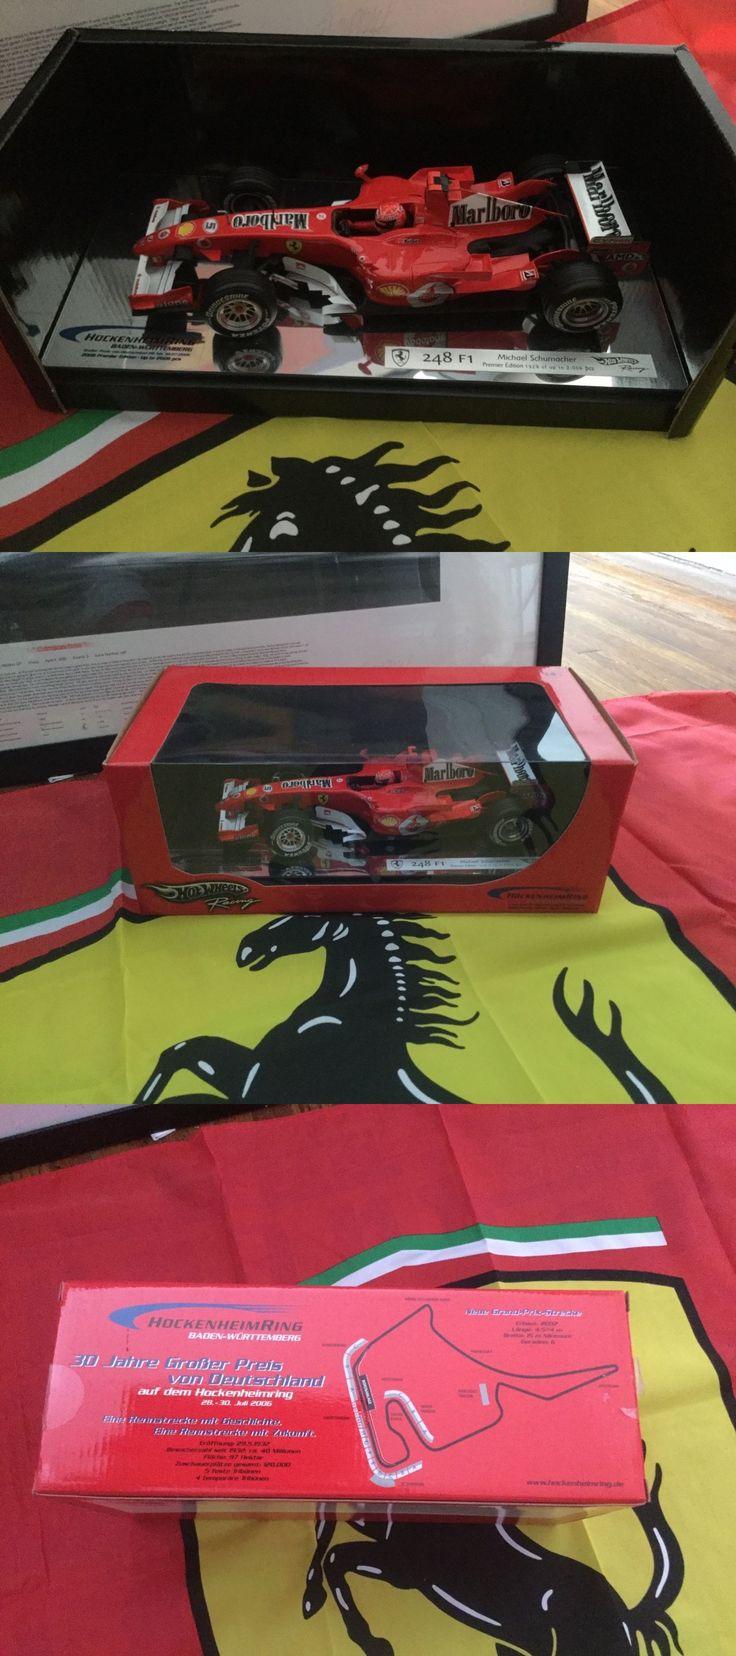 Formula 1 Cars 180270: Michael Schumacher Marlboro 248 F1 2006 Hockenheimring Hot Wheels Racing Car -> BUY IT NOW ONLY: $149.99 on eBay!